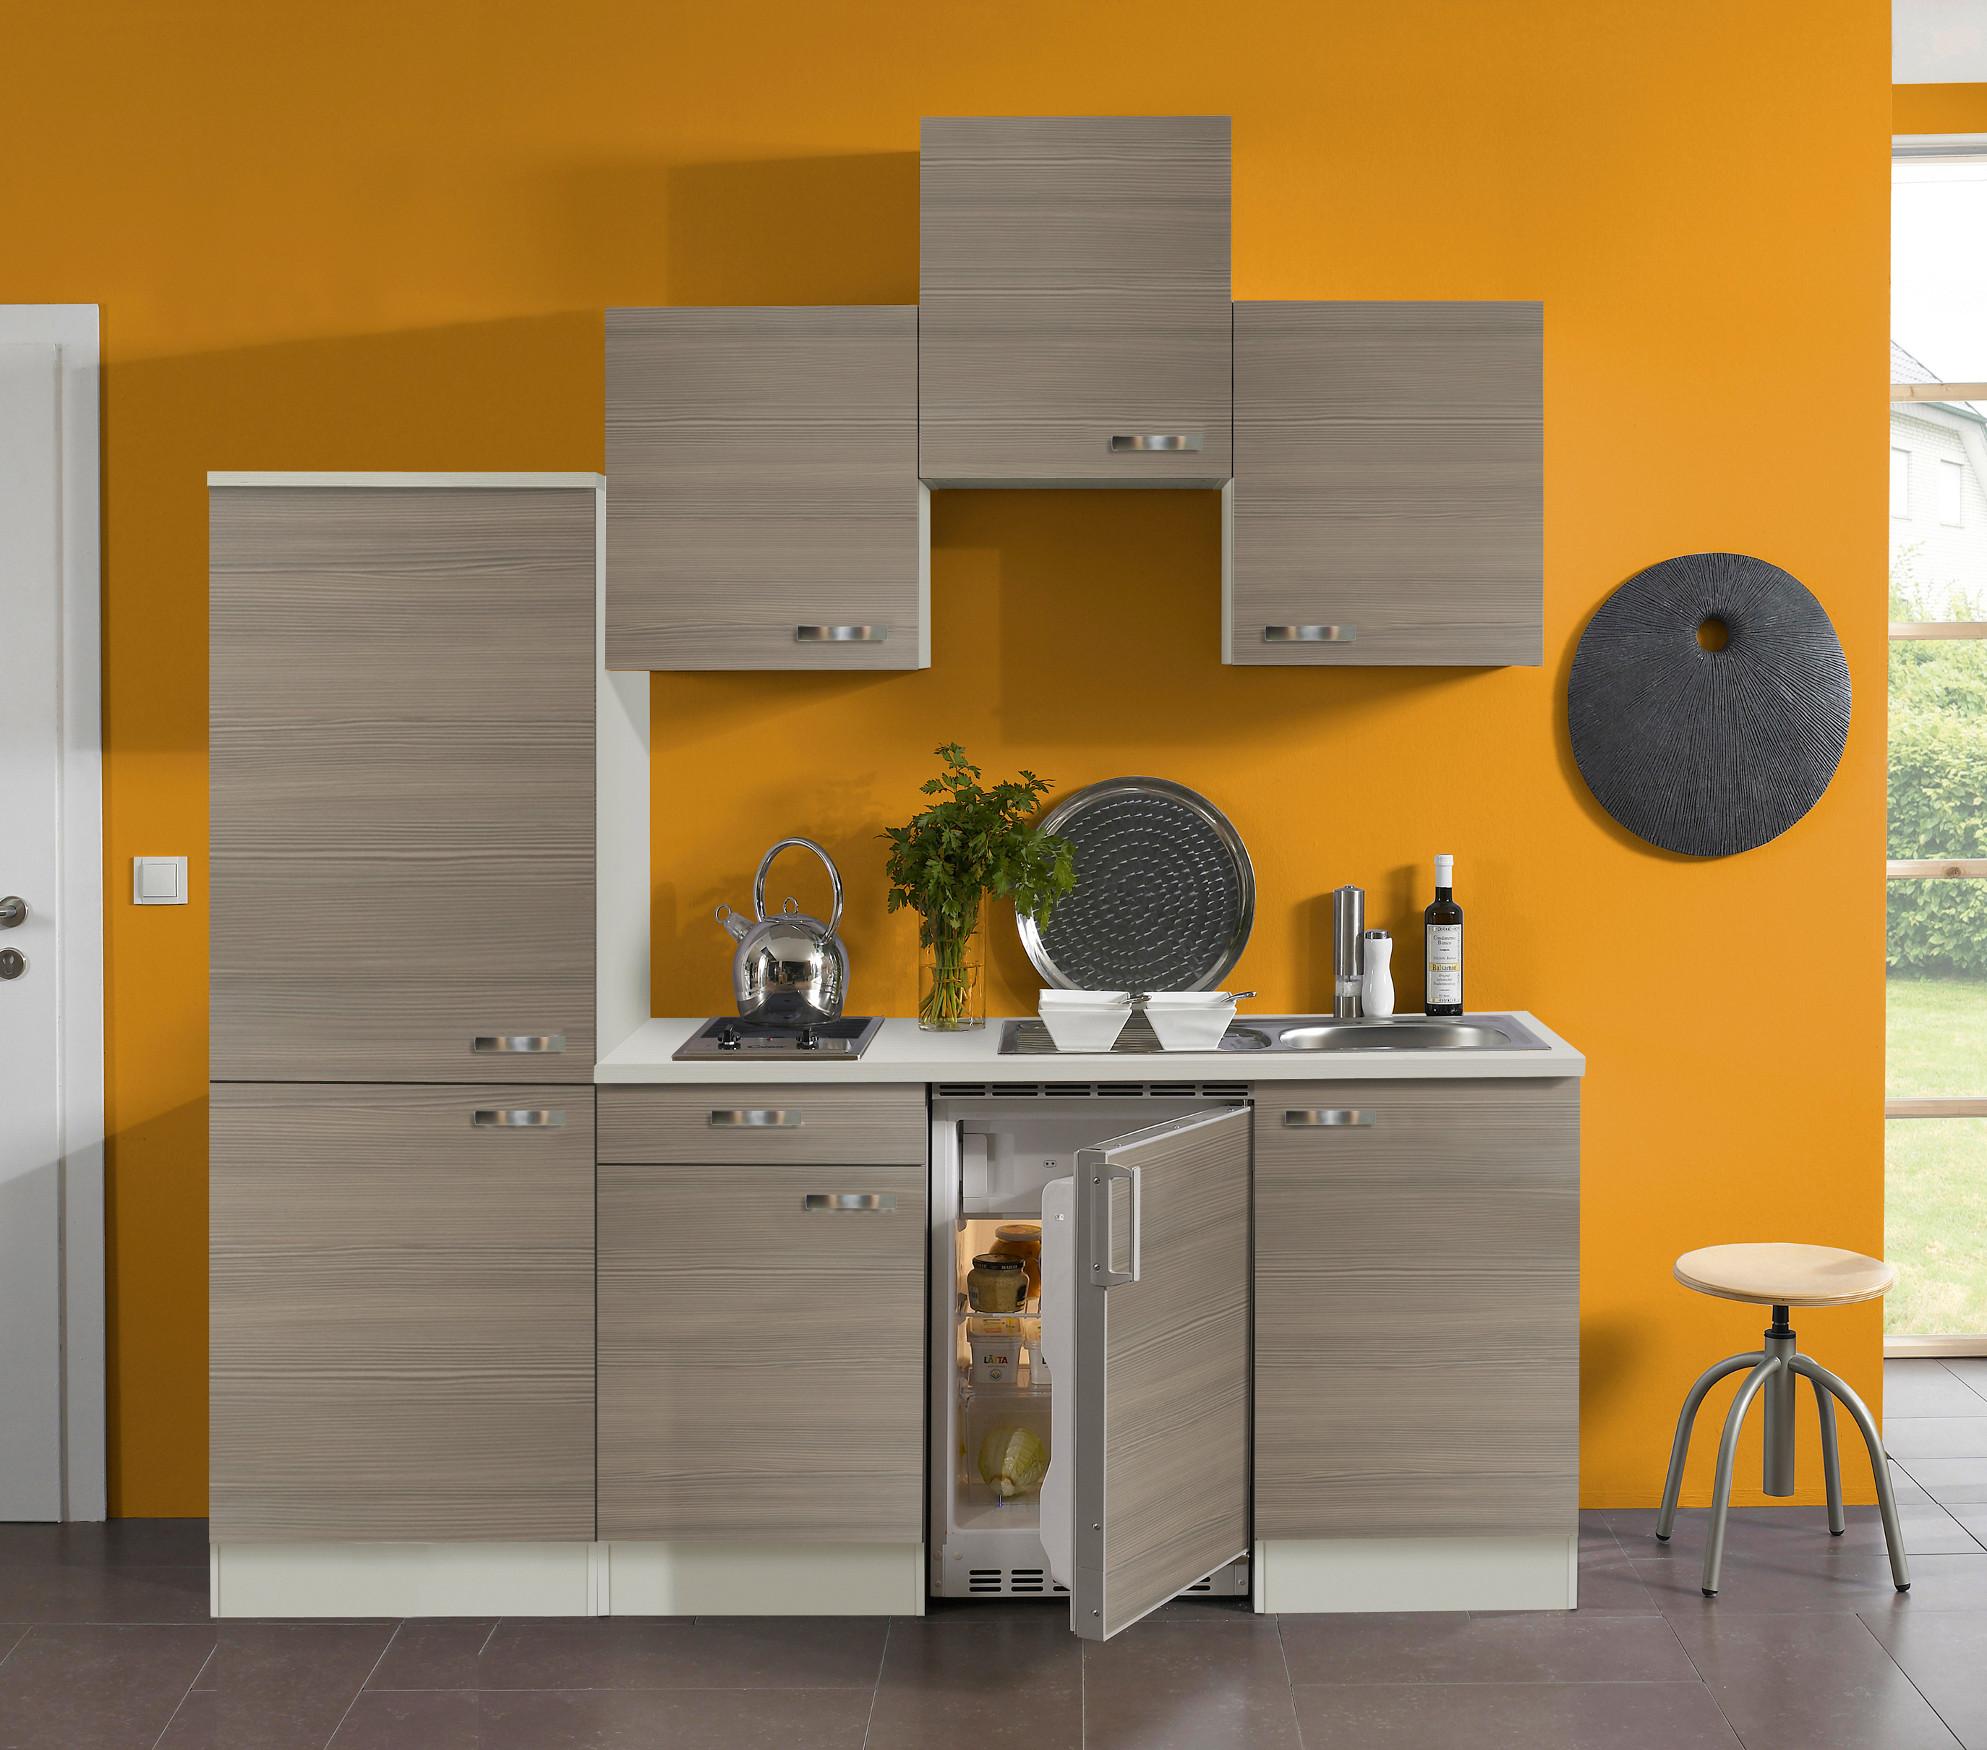 singlek che toledo vario 1 glaskeramik kochfeld. Black Bedroom Furniture Sets. Home Design Ideas